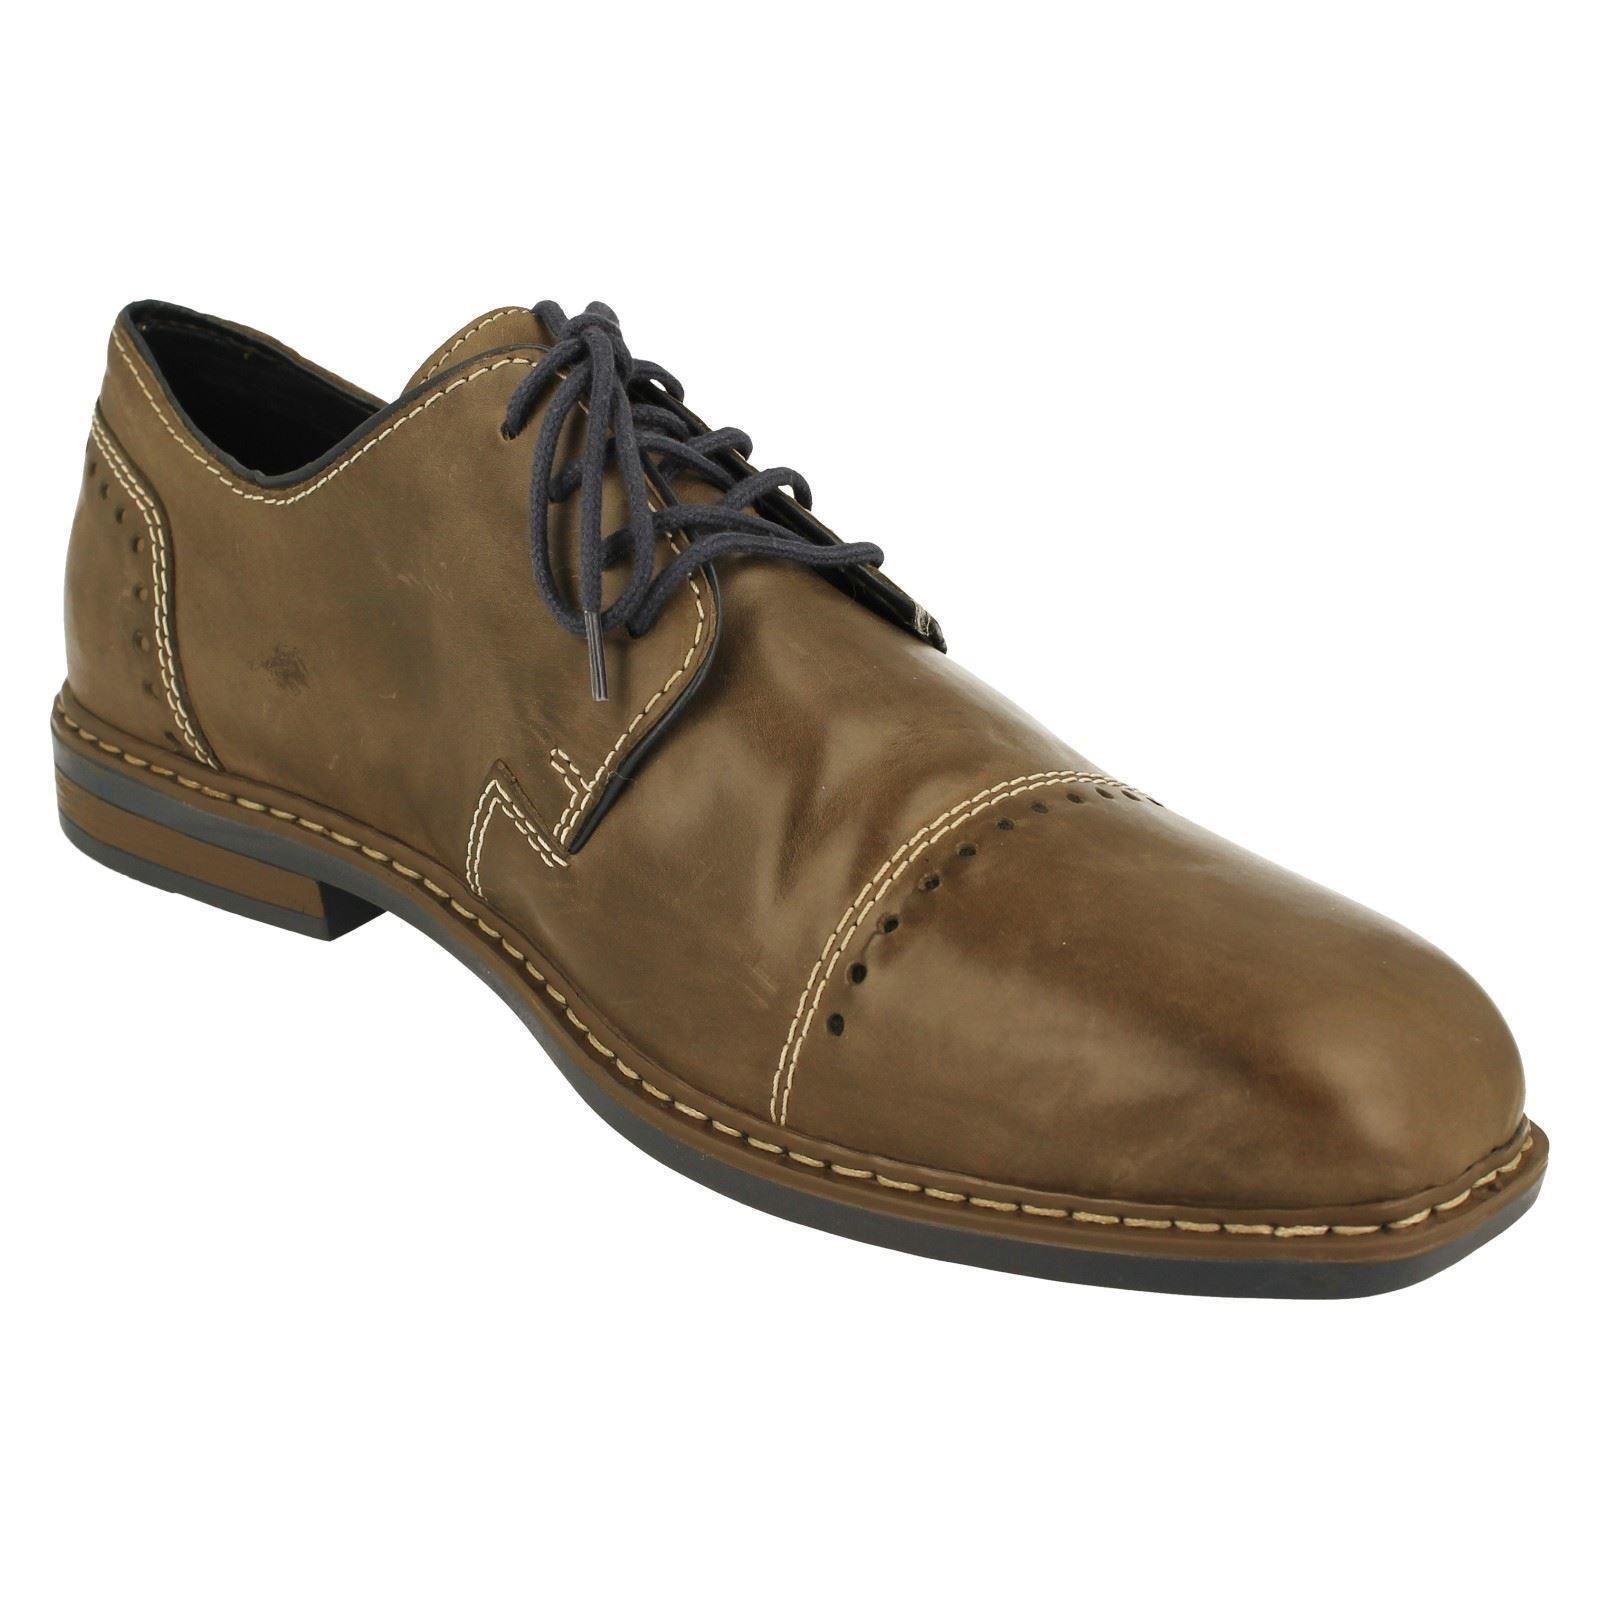 Billig Shoes hohe Qualität Mens Rieker Shoes Billig 10720-W 00513f